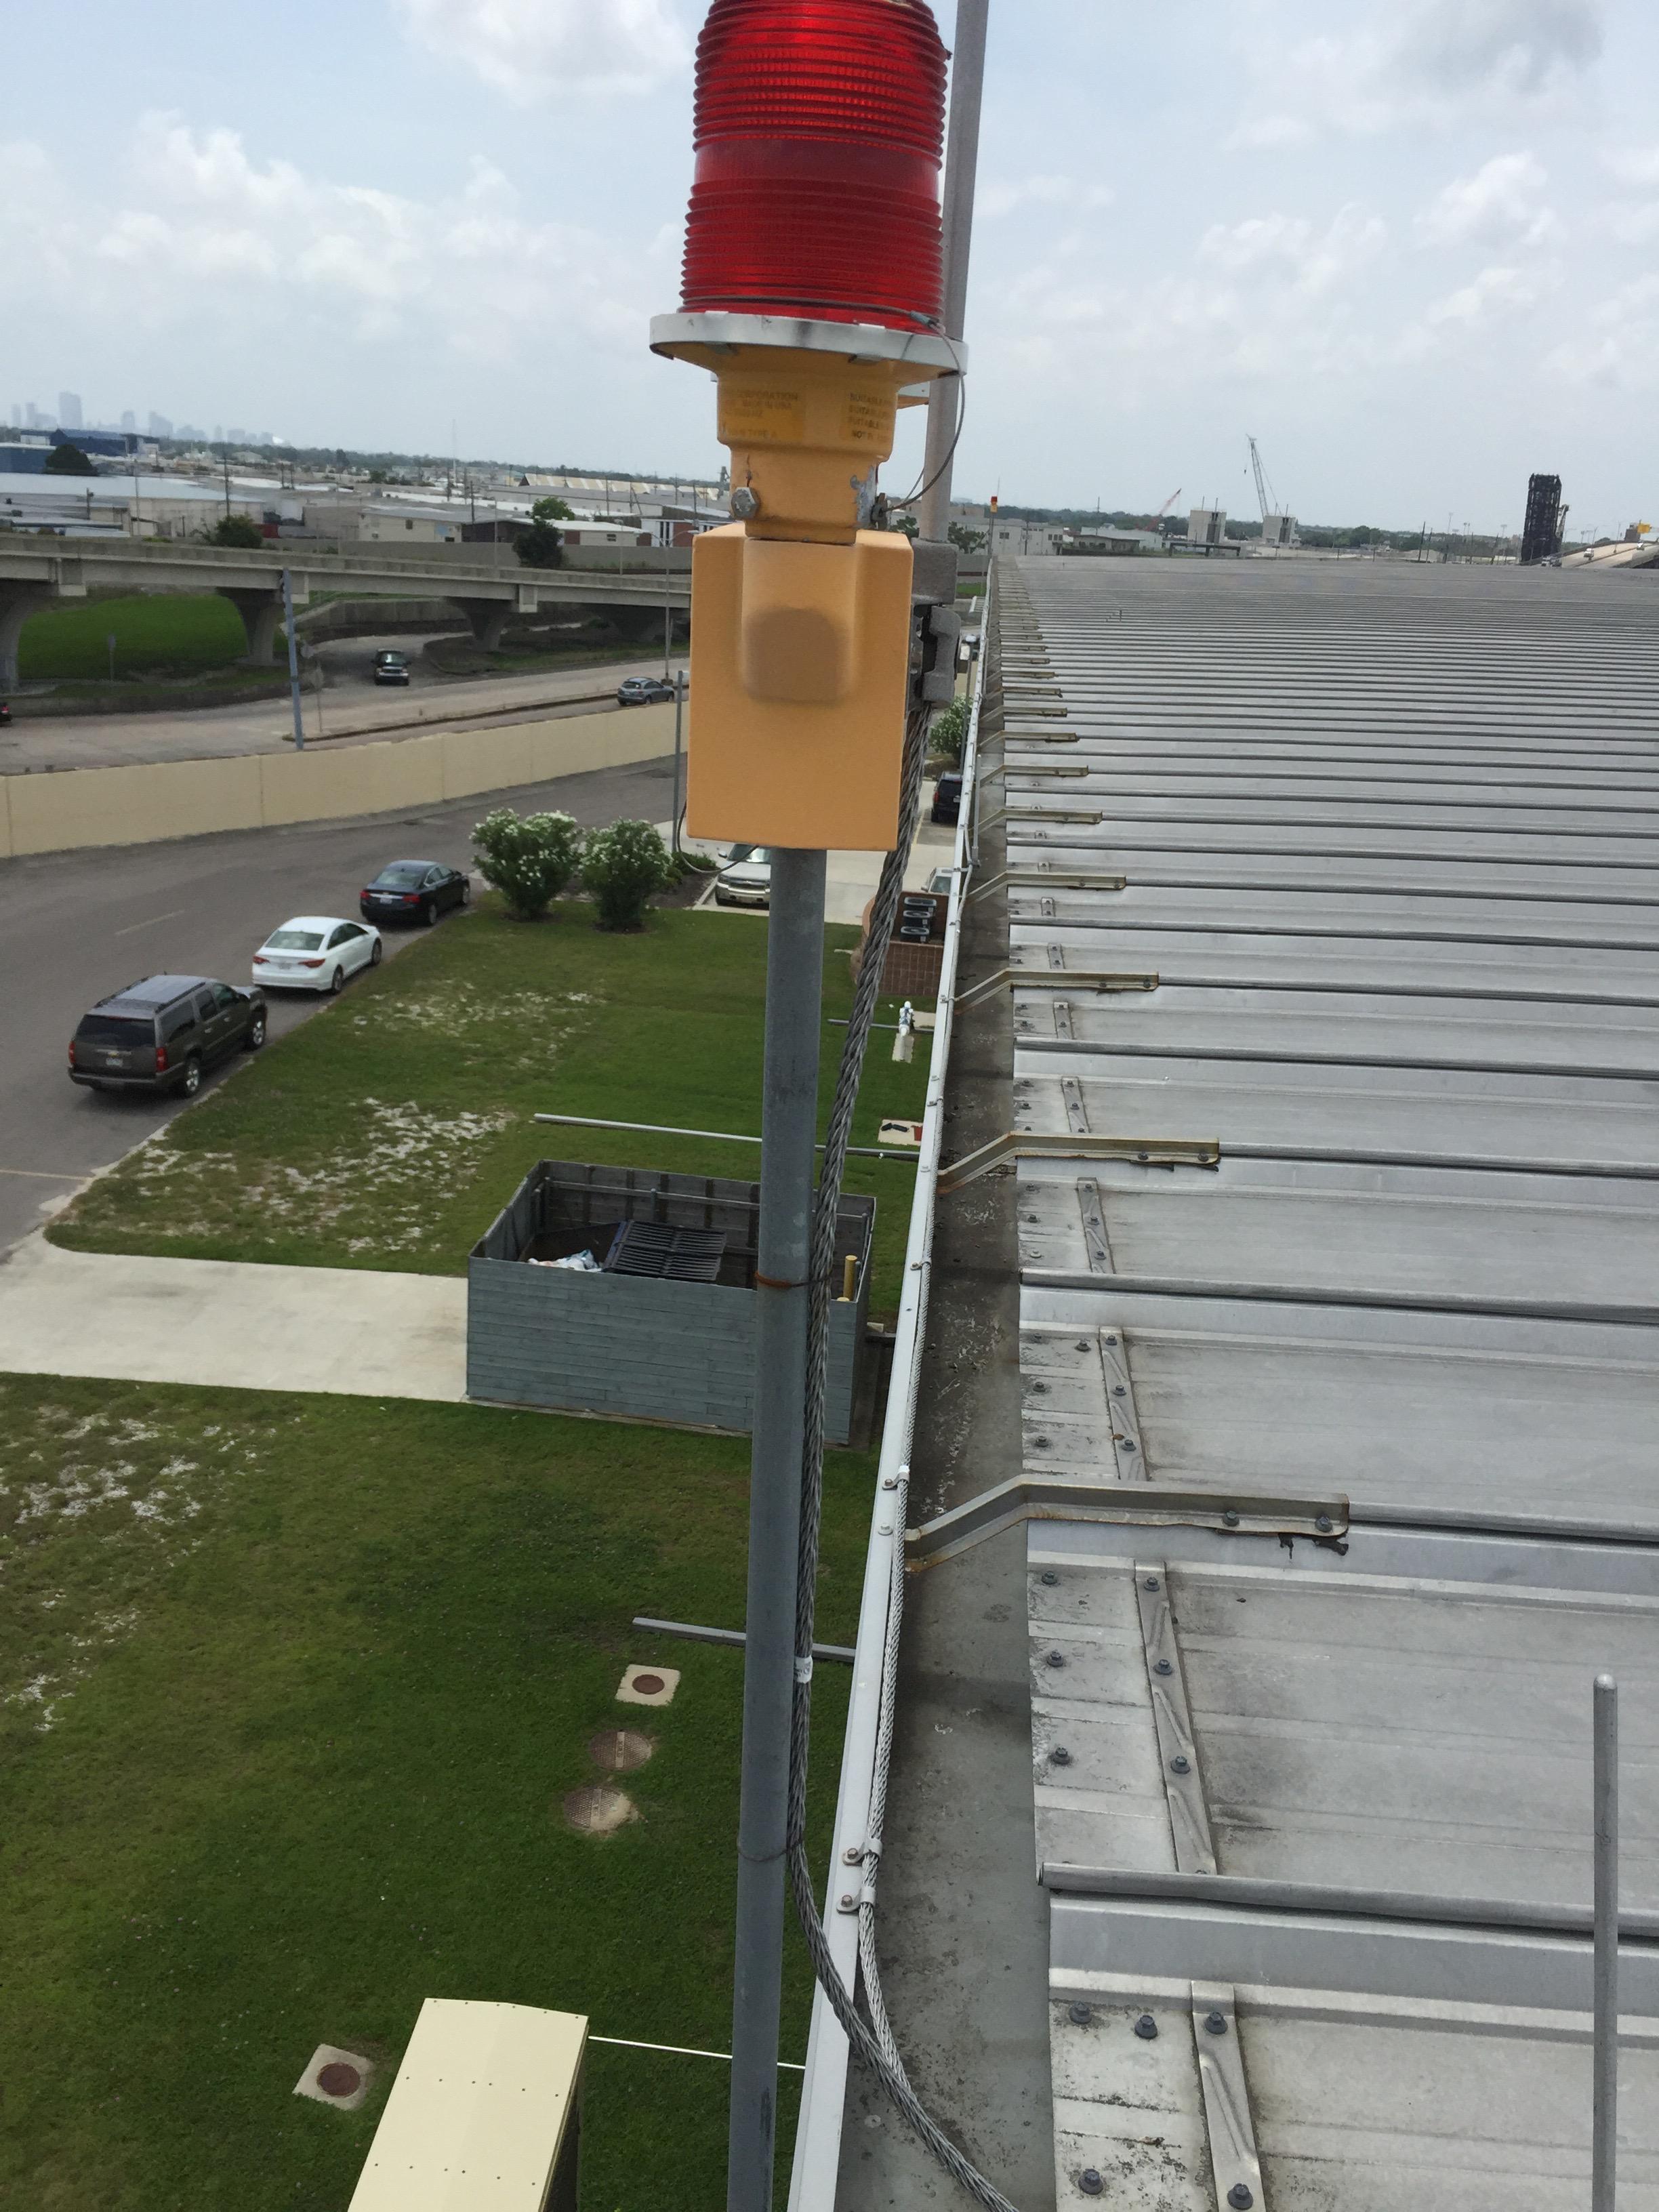 Rooftop warning lights